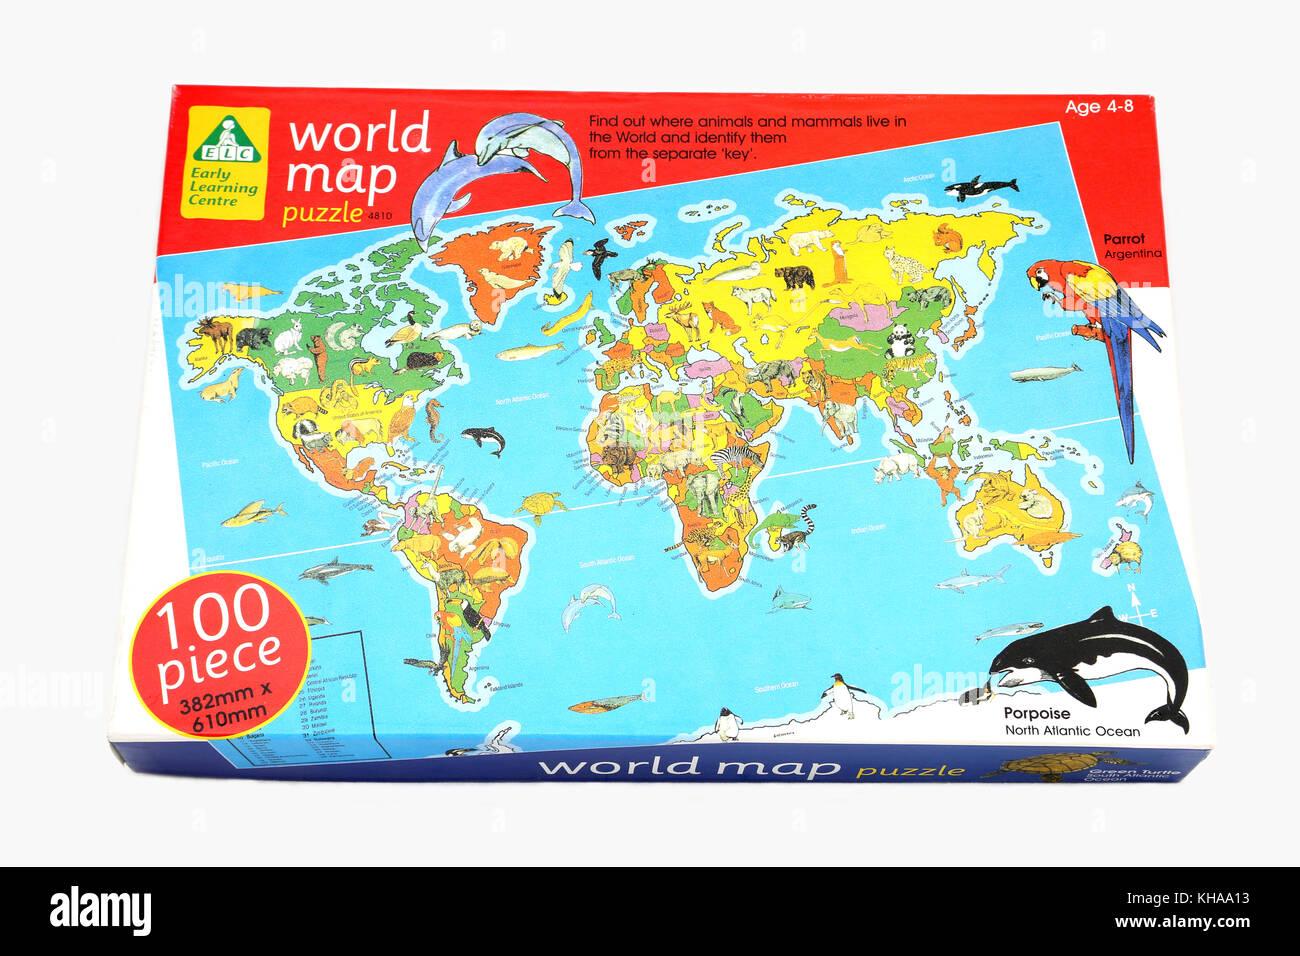 Jigsaw puzzle world map stock photos jigsaw puzzle world map stock early learning centre world map jigsaw puzzle stock image gumiabroncs Image collections